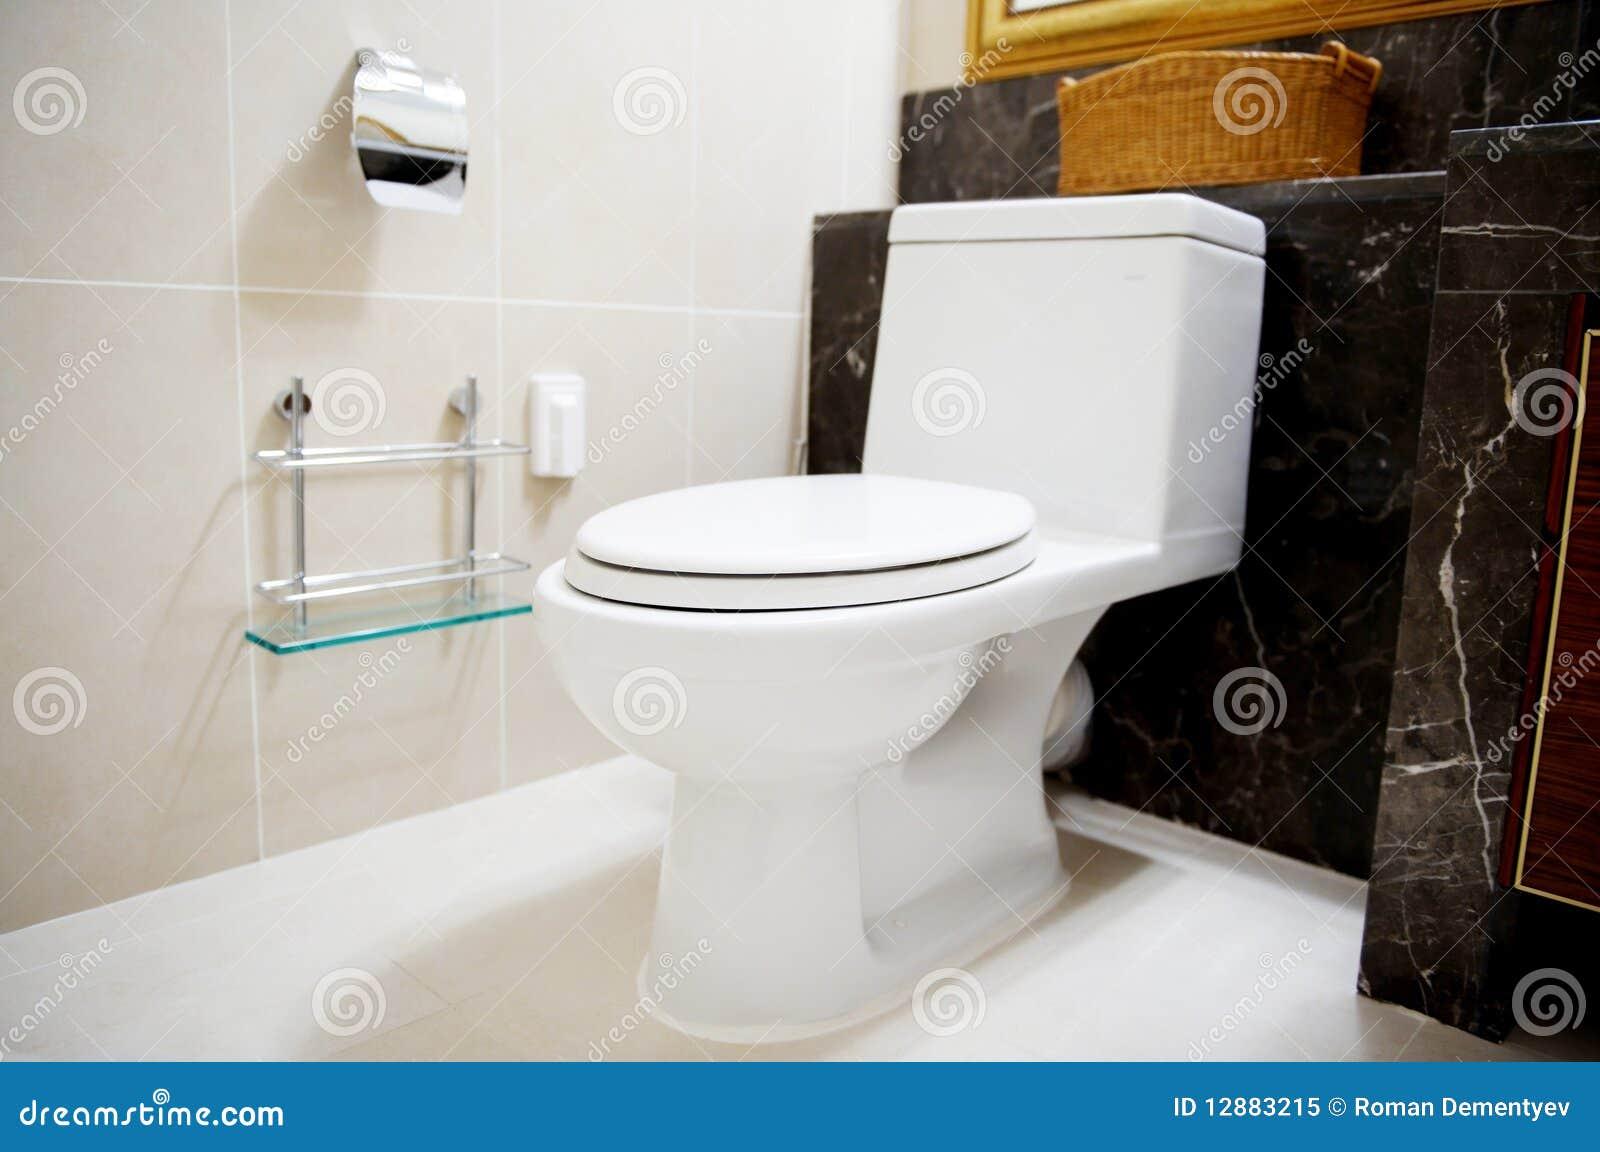 Water Closet Royalty Free Stock Photo Image 12883215